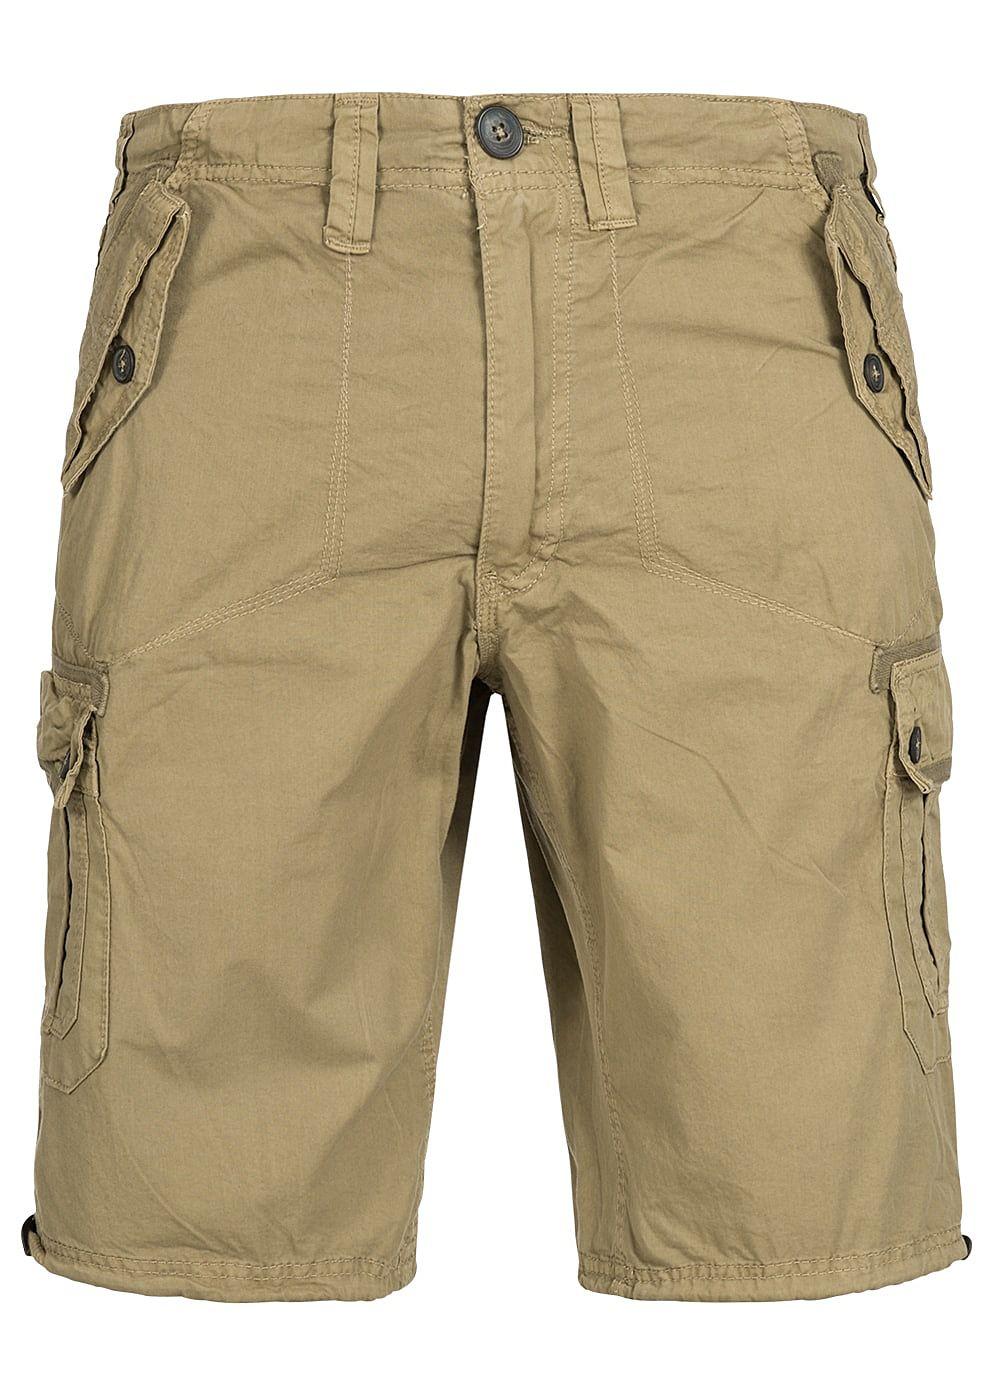 9579abcdcb330 Seventyseven Lifestyle Herren Cargo Shorts 6-Pockets sand beige